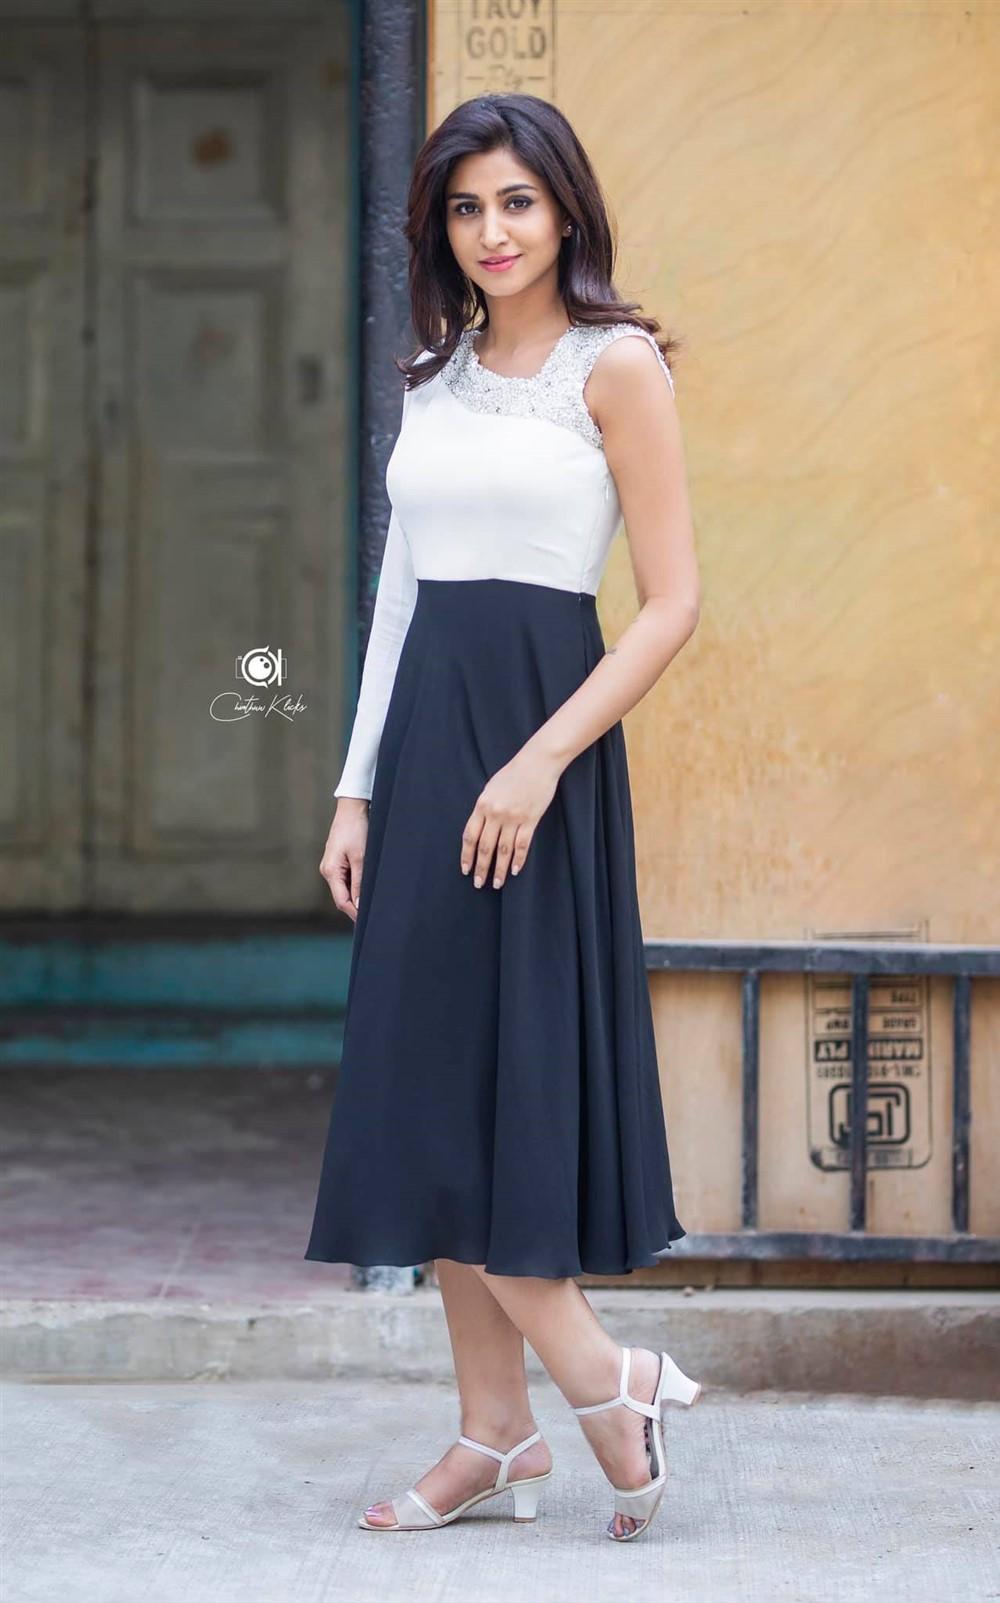 Actress Varshini Sounderajan New Photoshoot Pictures